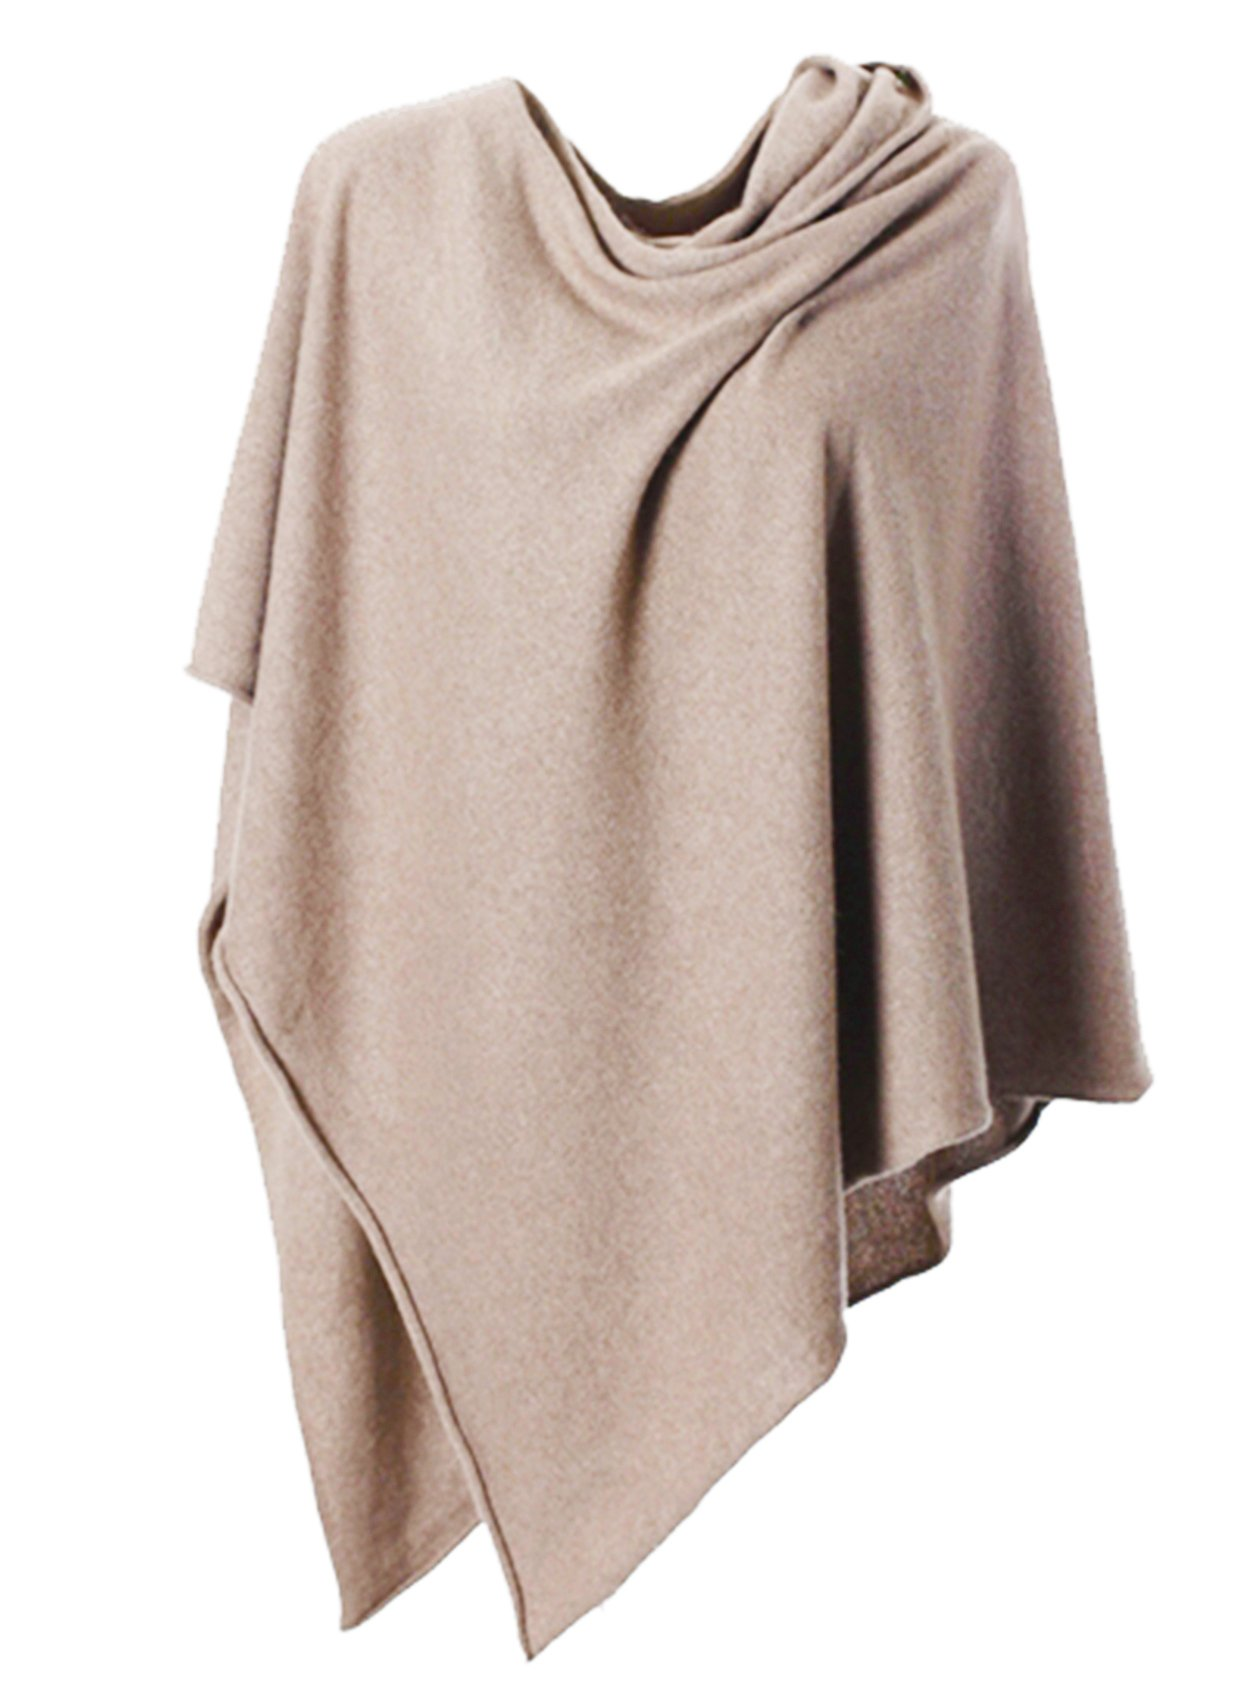 Anna Kristine Asymmetrical 100% Cashmere Draped Poncho Topper - Simply Beige